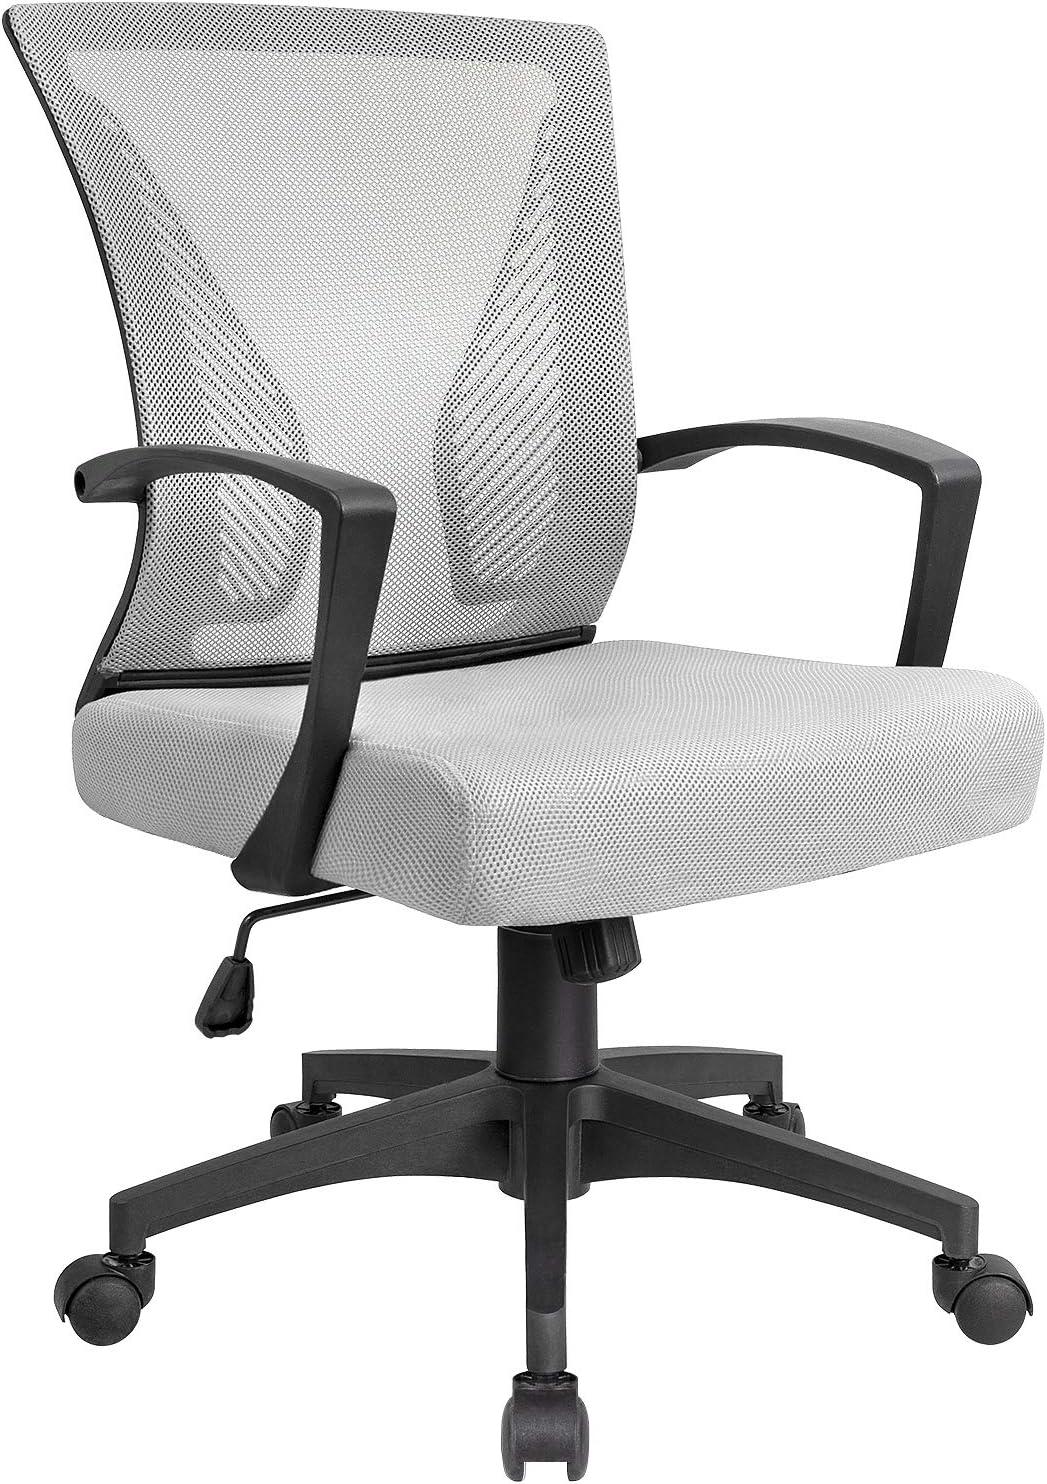 KaiMeng Ergonomic Mesh Chair